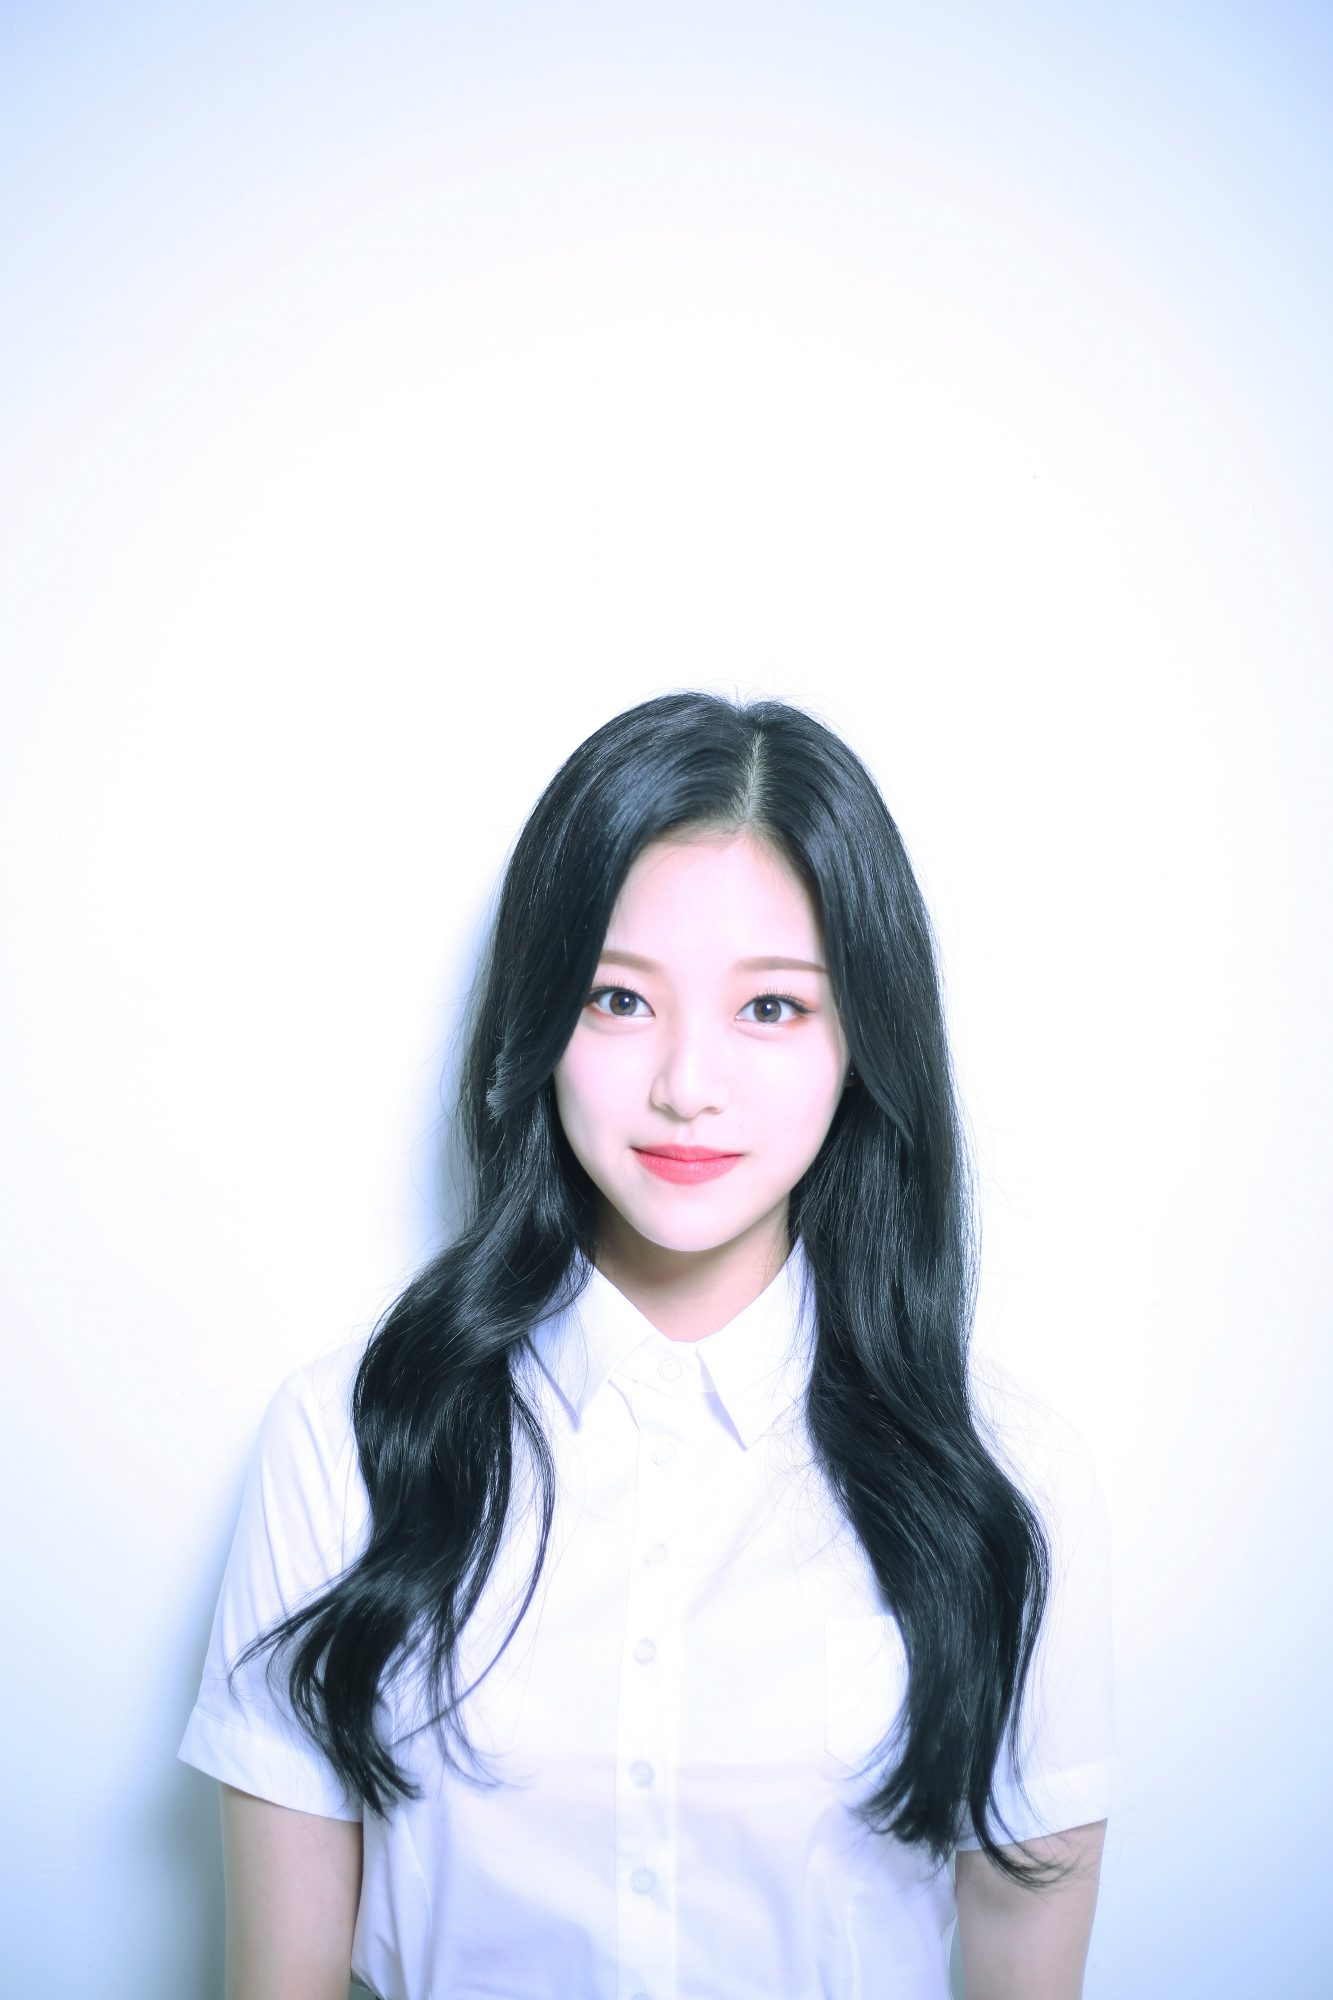 Image - LOONA 1-3 HyunJin Photo.PNG | Kpop Wiki | FANDOM